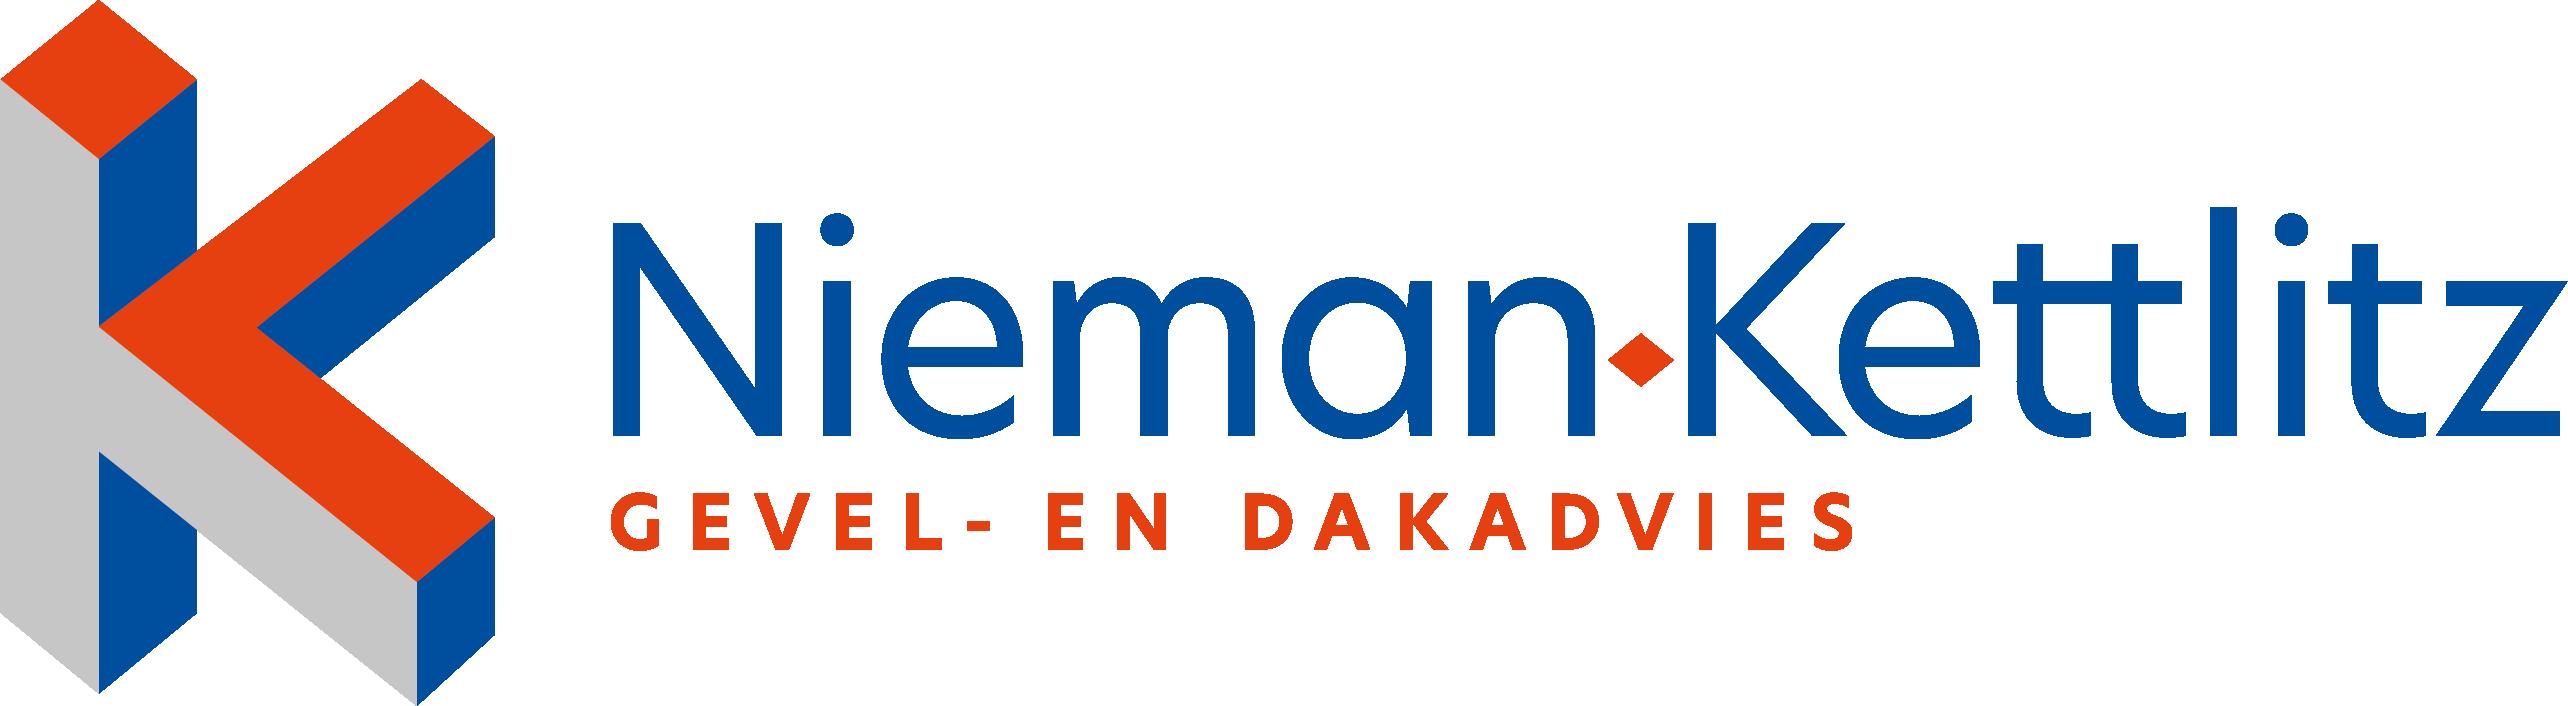 Nieman-Kettlitz Gevel- en Dakadvies